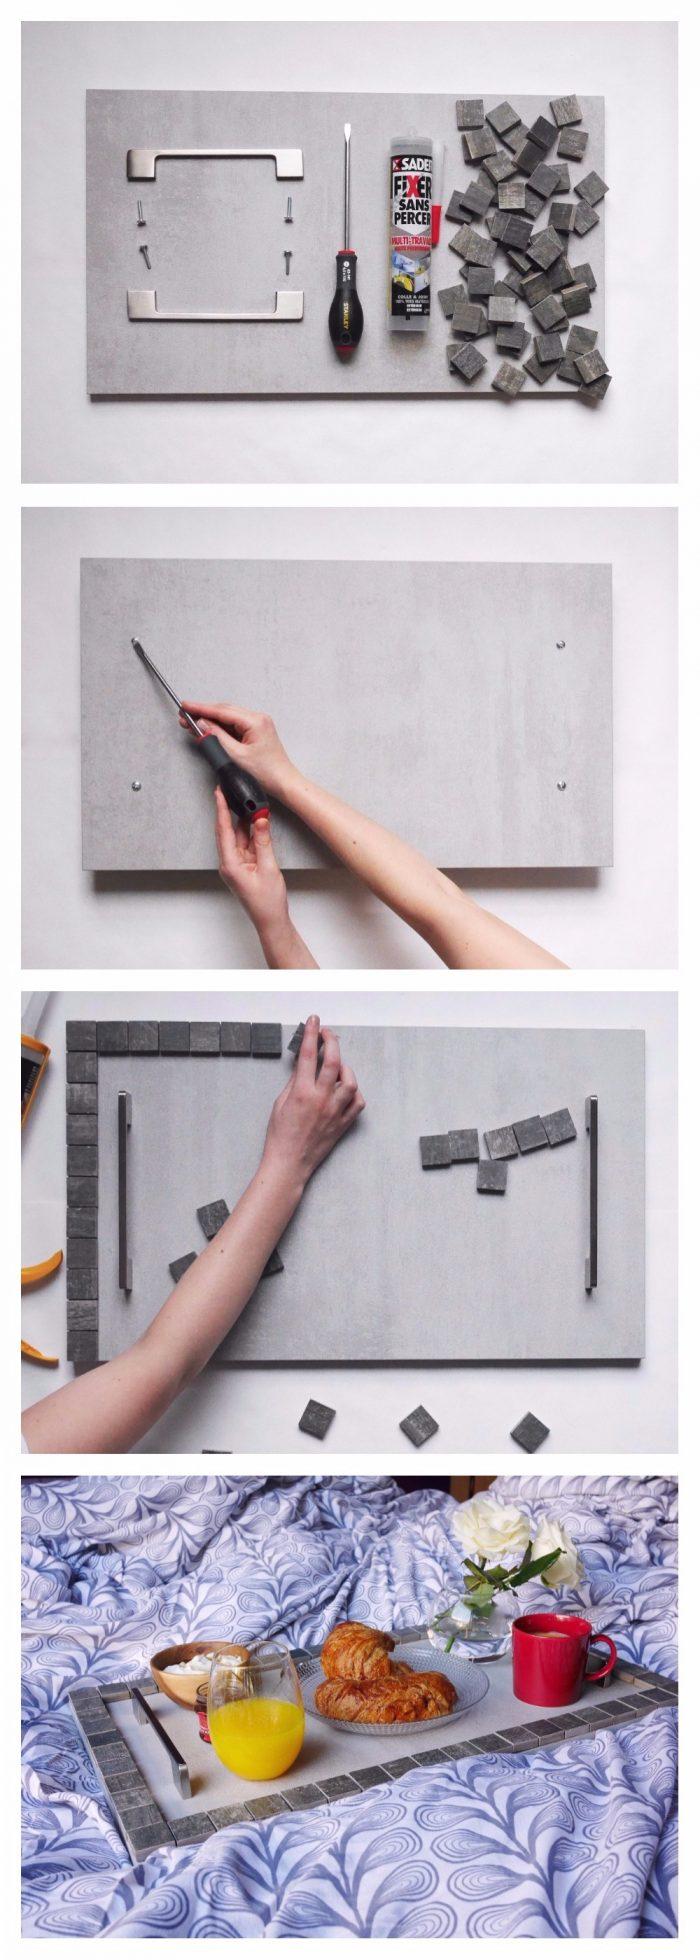 DIY recup upcylcing detourner meuble de cuisine plateau clemaroundthecorner.com